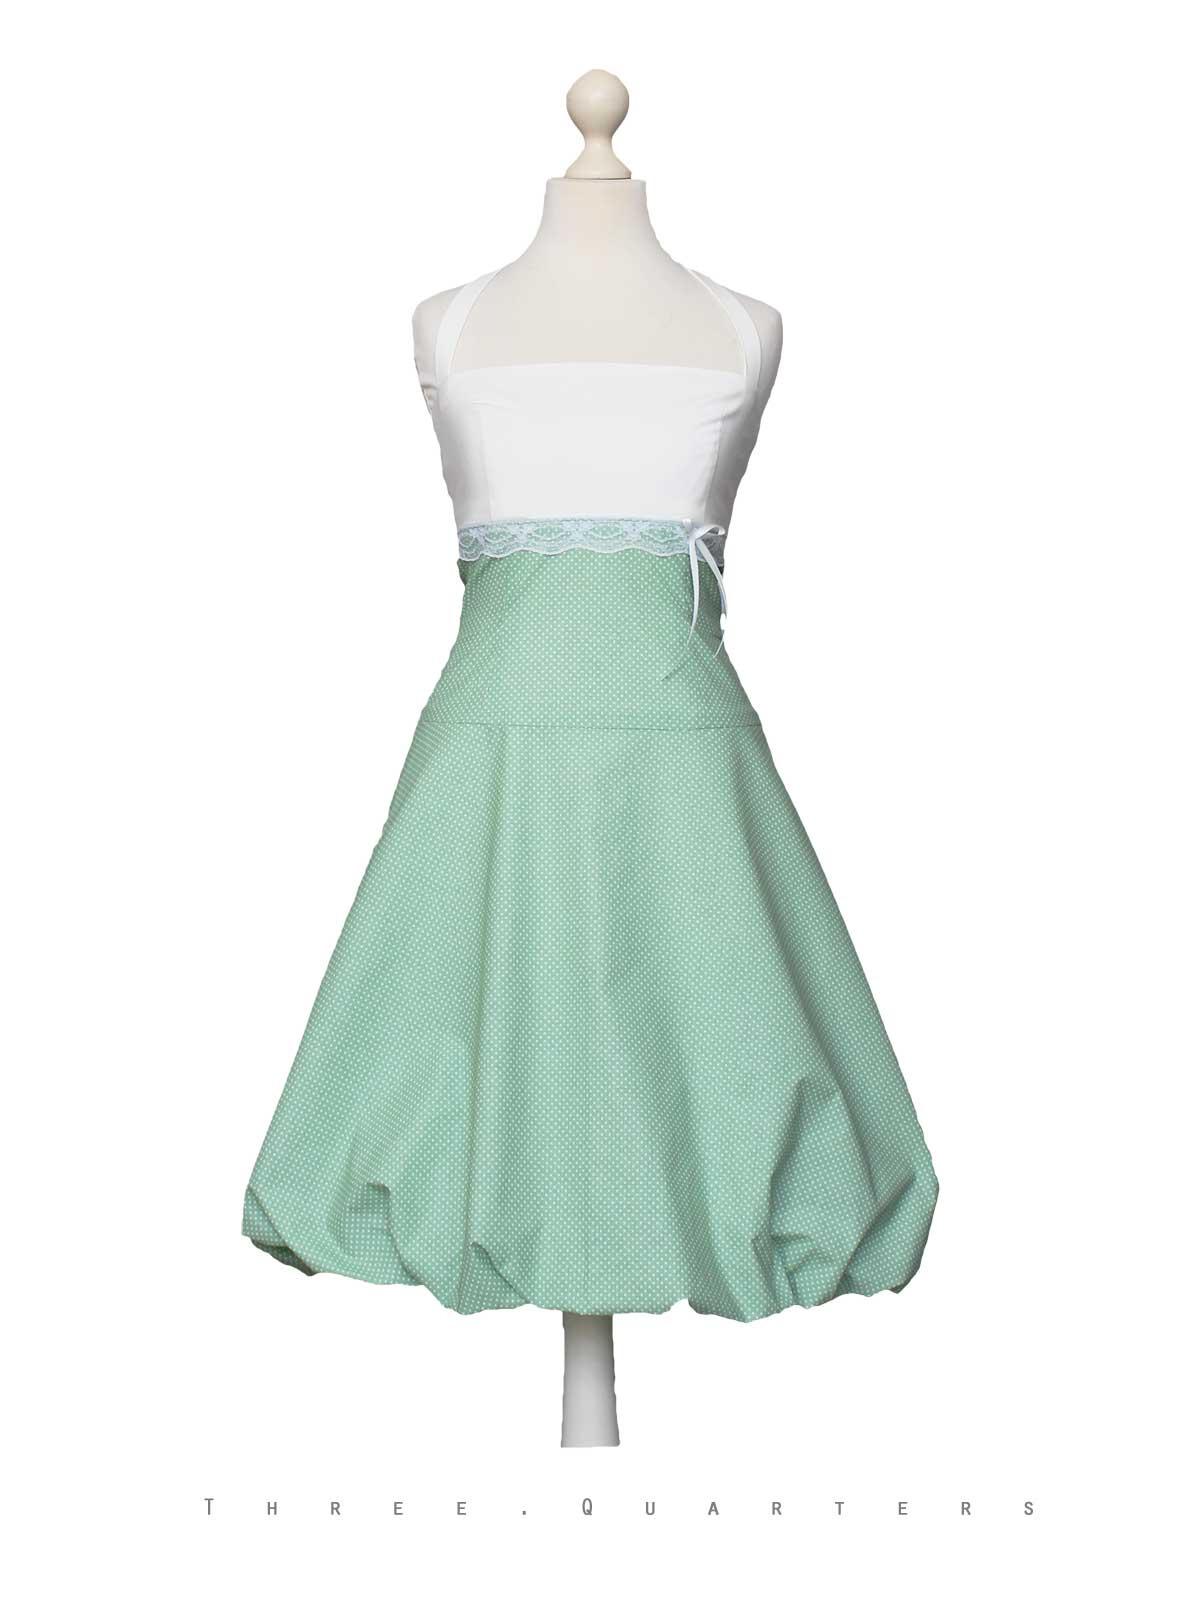 Three-Quarters - Ballonkleid, Kleid, Abendkleid, Grün